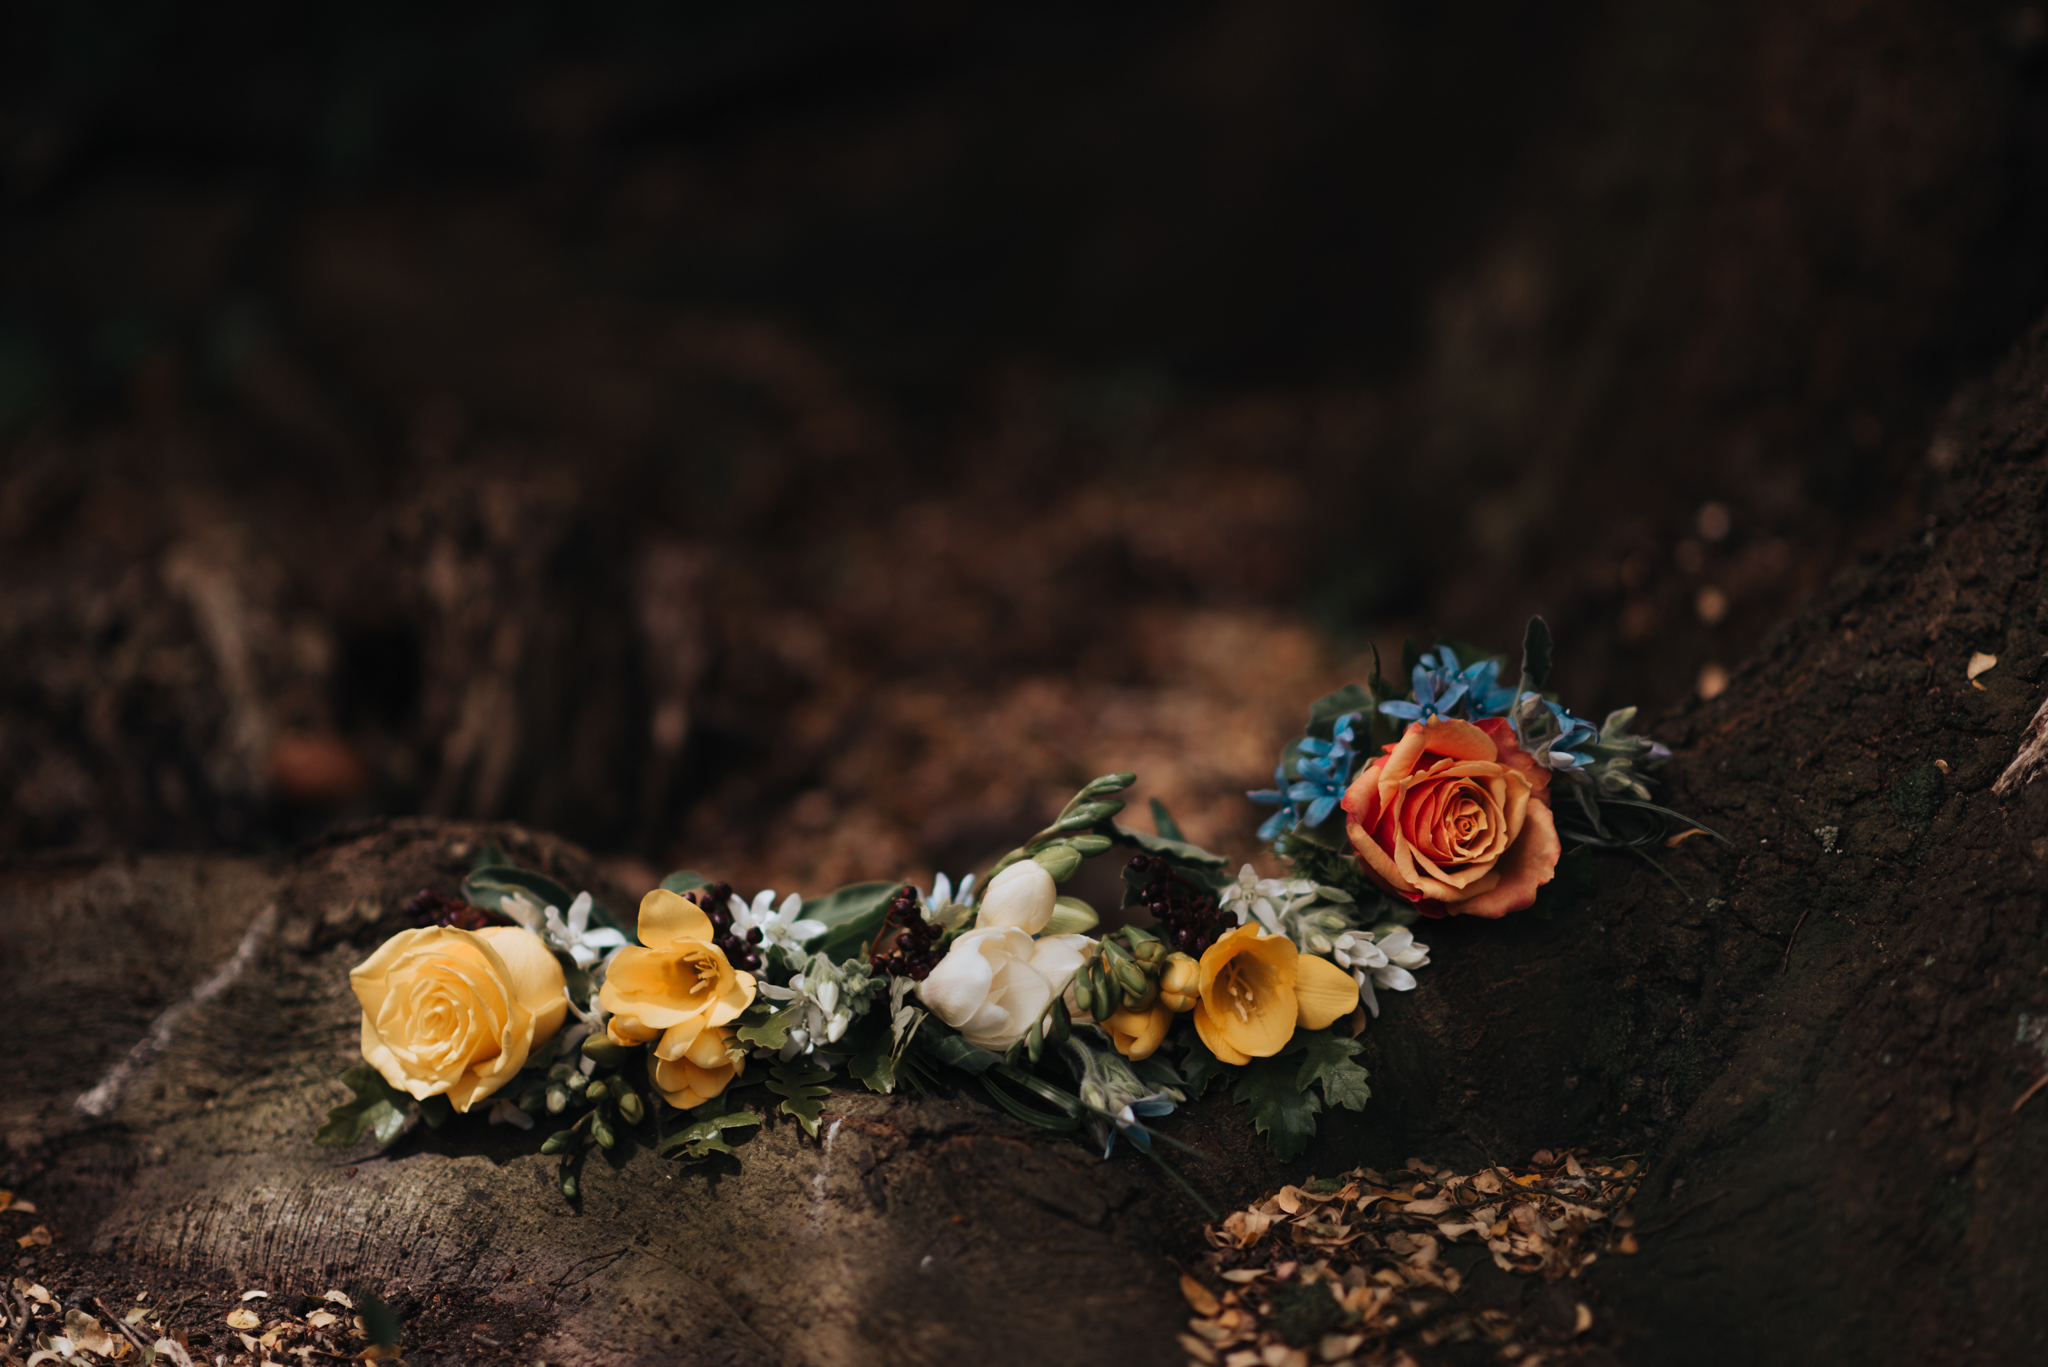 LOVELENSCAPES PHOTOGRAPHY • VISUAL POETRY • NEW ZEALAND WEDDING PHOTOGRAPHER • AUSTRALIAN WEDDING PHOTOGRAPHER • BRISBANE • MELBOURNE • SYDNEY • HOBART • TARUREKA ESTATE • ANNA CAMPBELL • 91.jpg